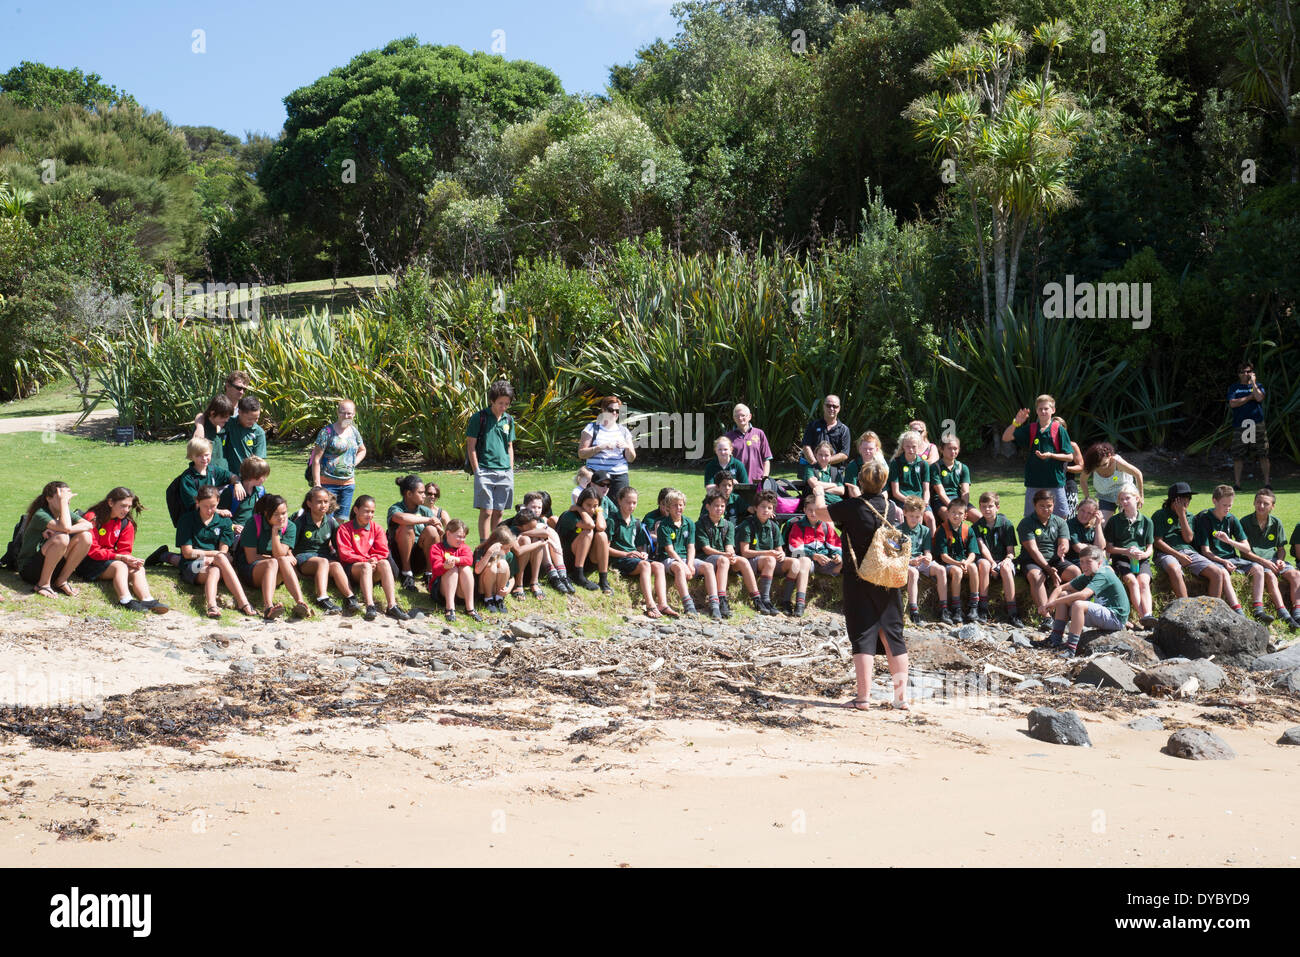 Educational tour schoolchildren listening to a teacher during a coastal visit New Zealand - Stock Image